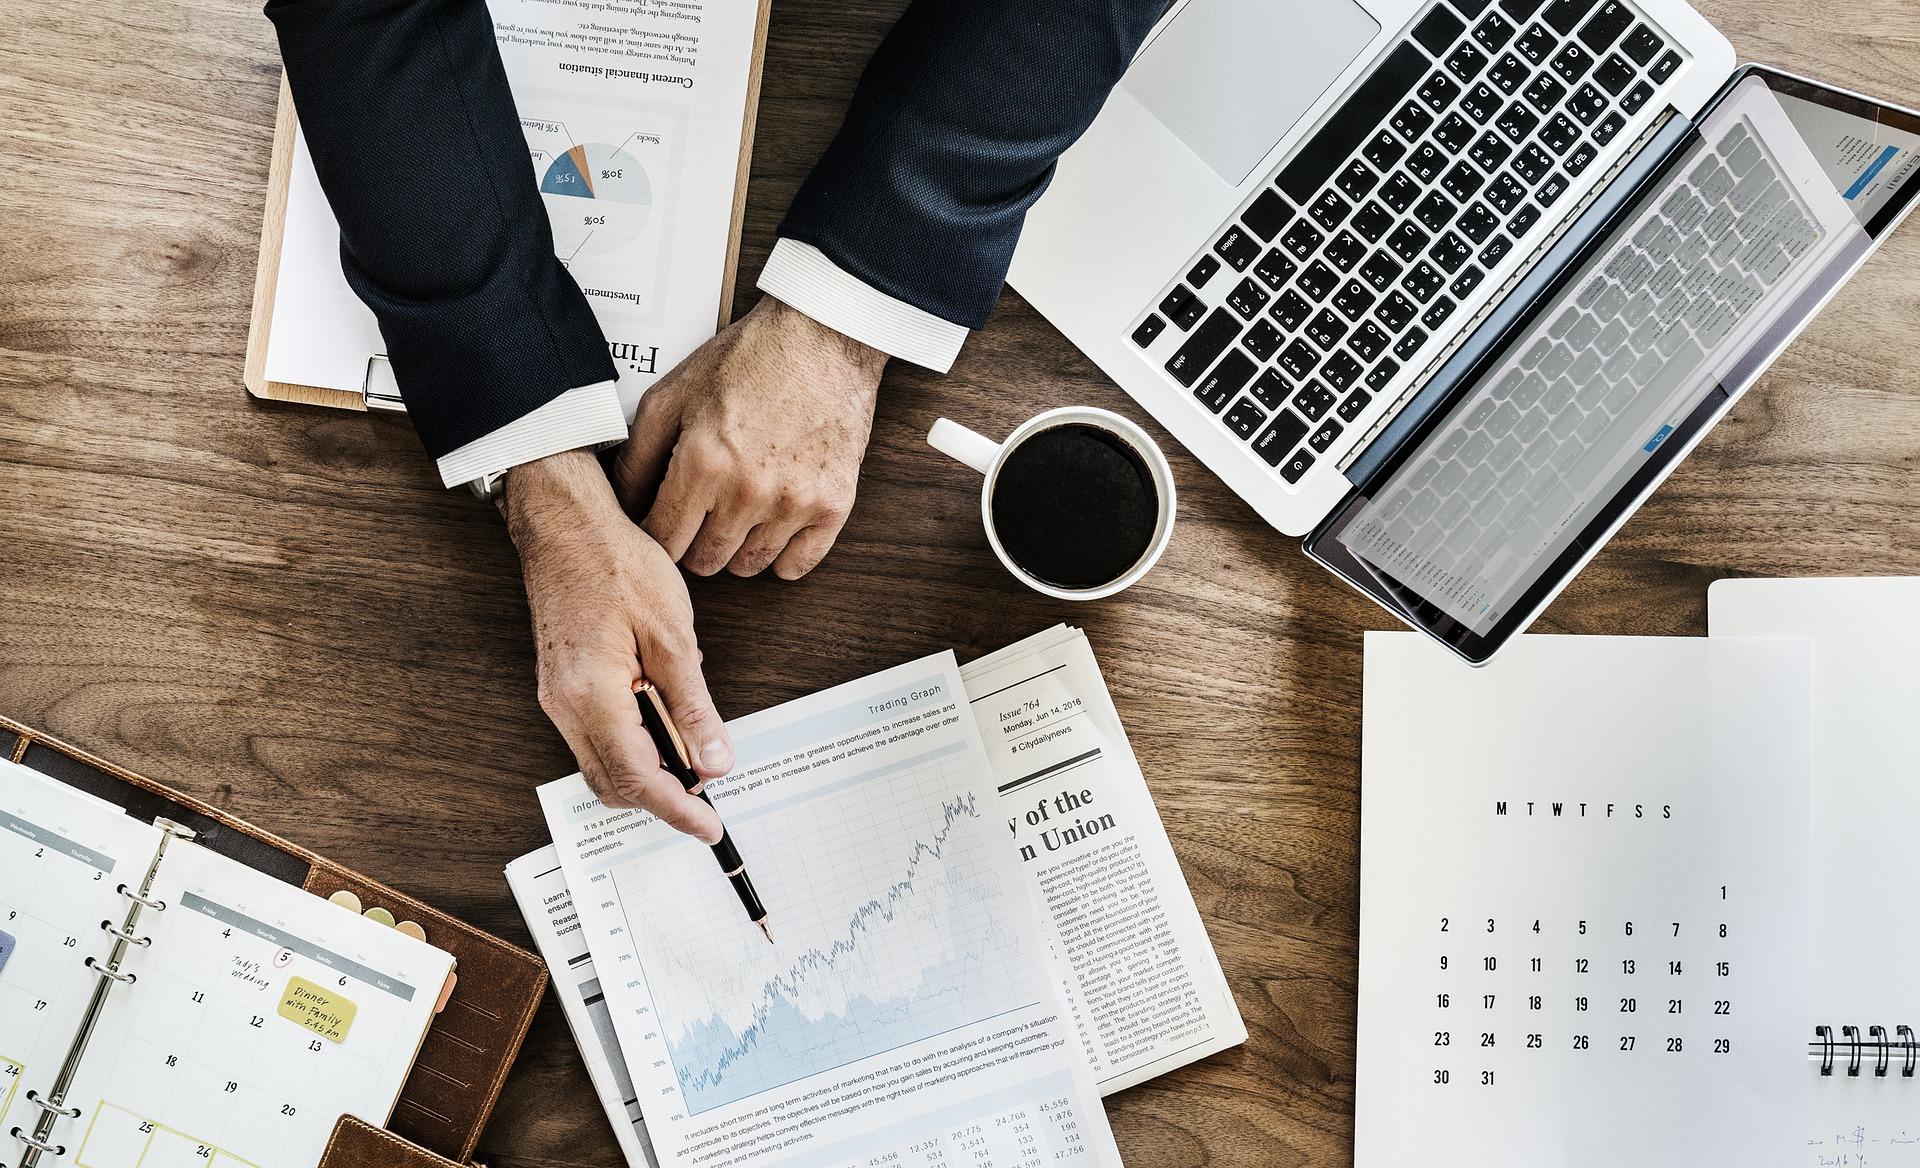 Business Goals You Should Set in 2019